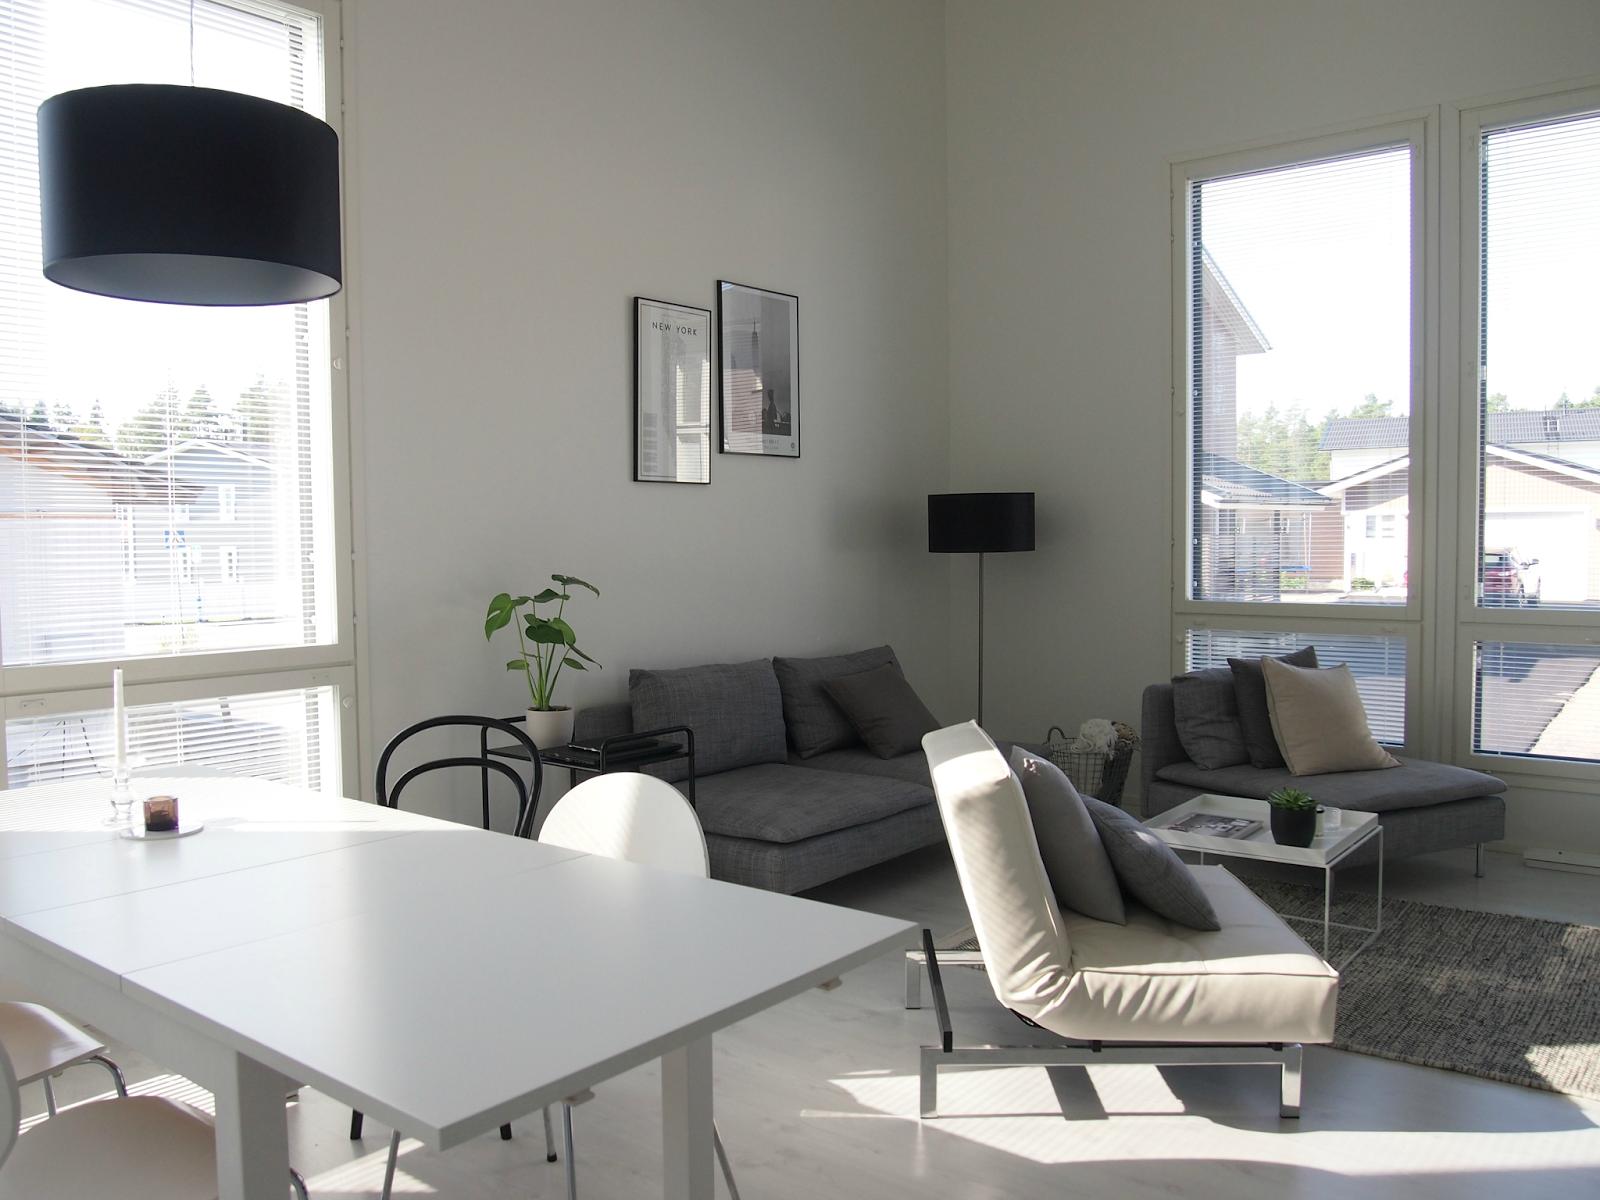 Hannas Home / livingroom / simple and modern / Scandinavian style